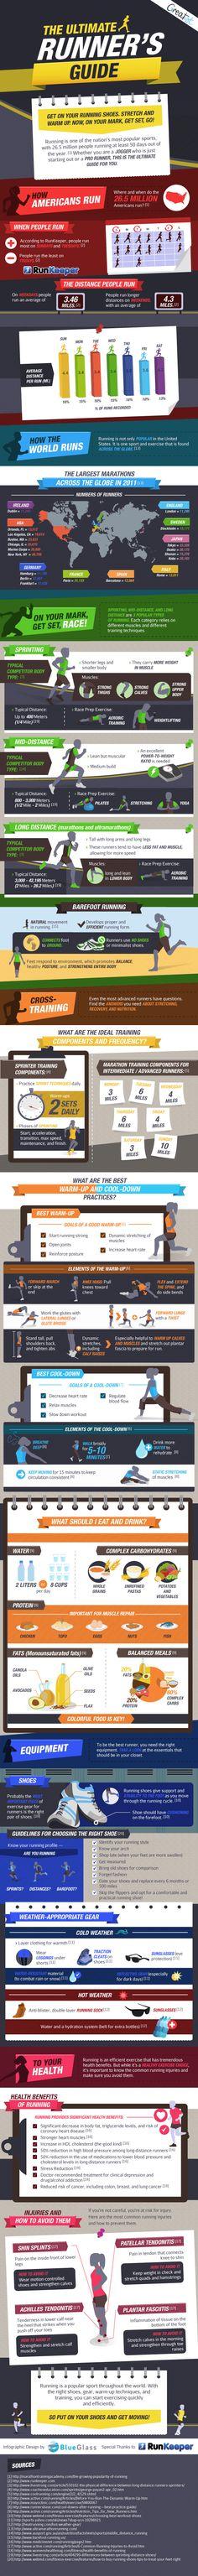 The Ultimate Runner's Guide